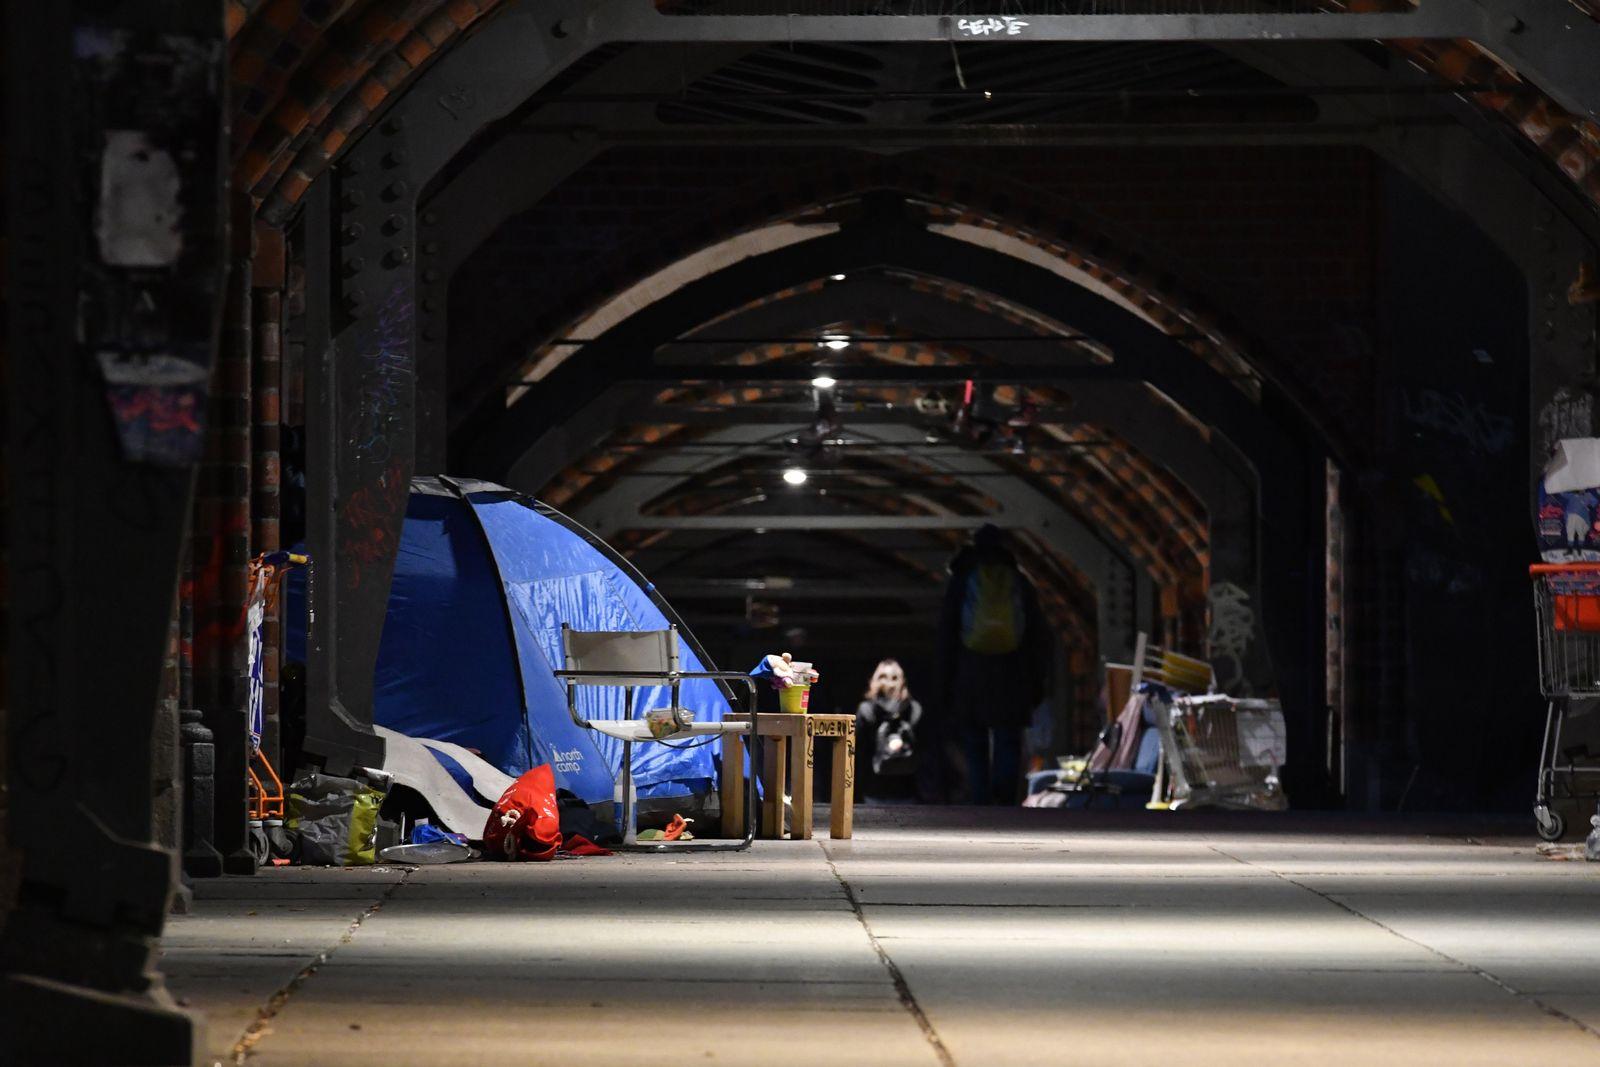 Obdachlose bei eisiger Kälte in Berlin